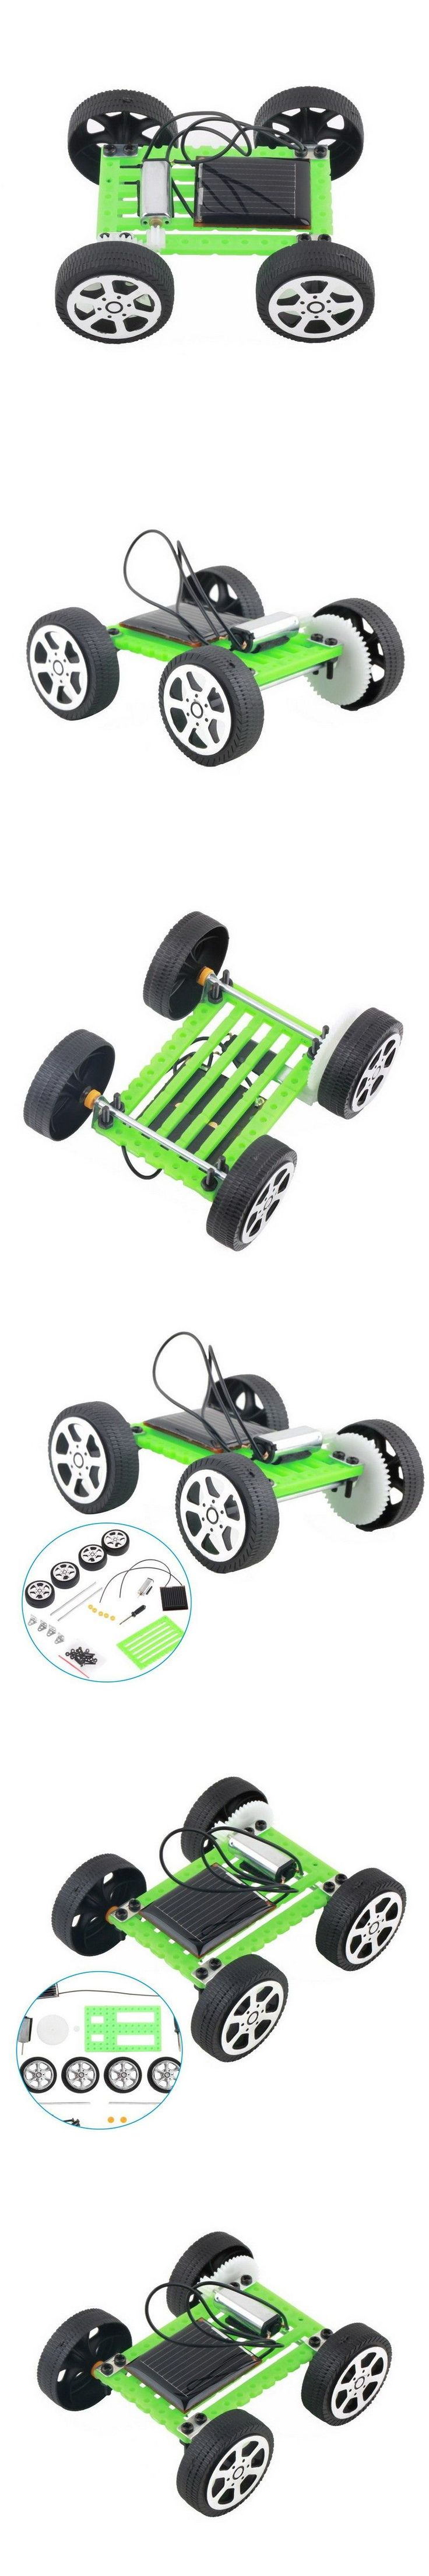 DIY Solar Toy Car Assemble Solar Vehicle Mini Solar Energy Powdered Toys Racer Child Kid Solar Car Education Kit VB217 P